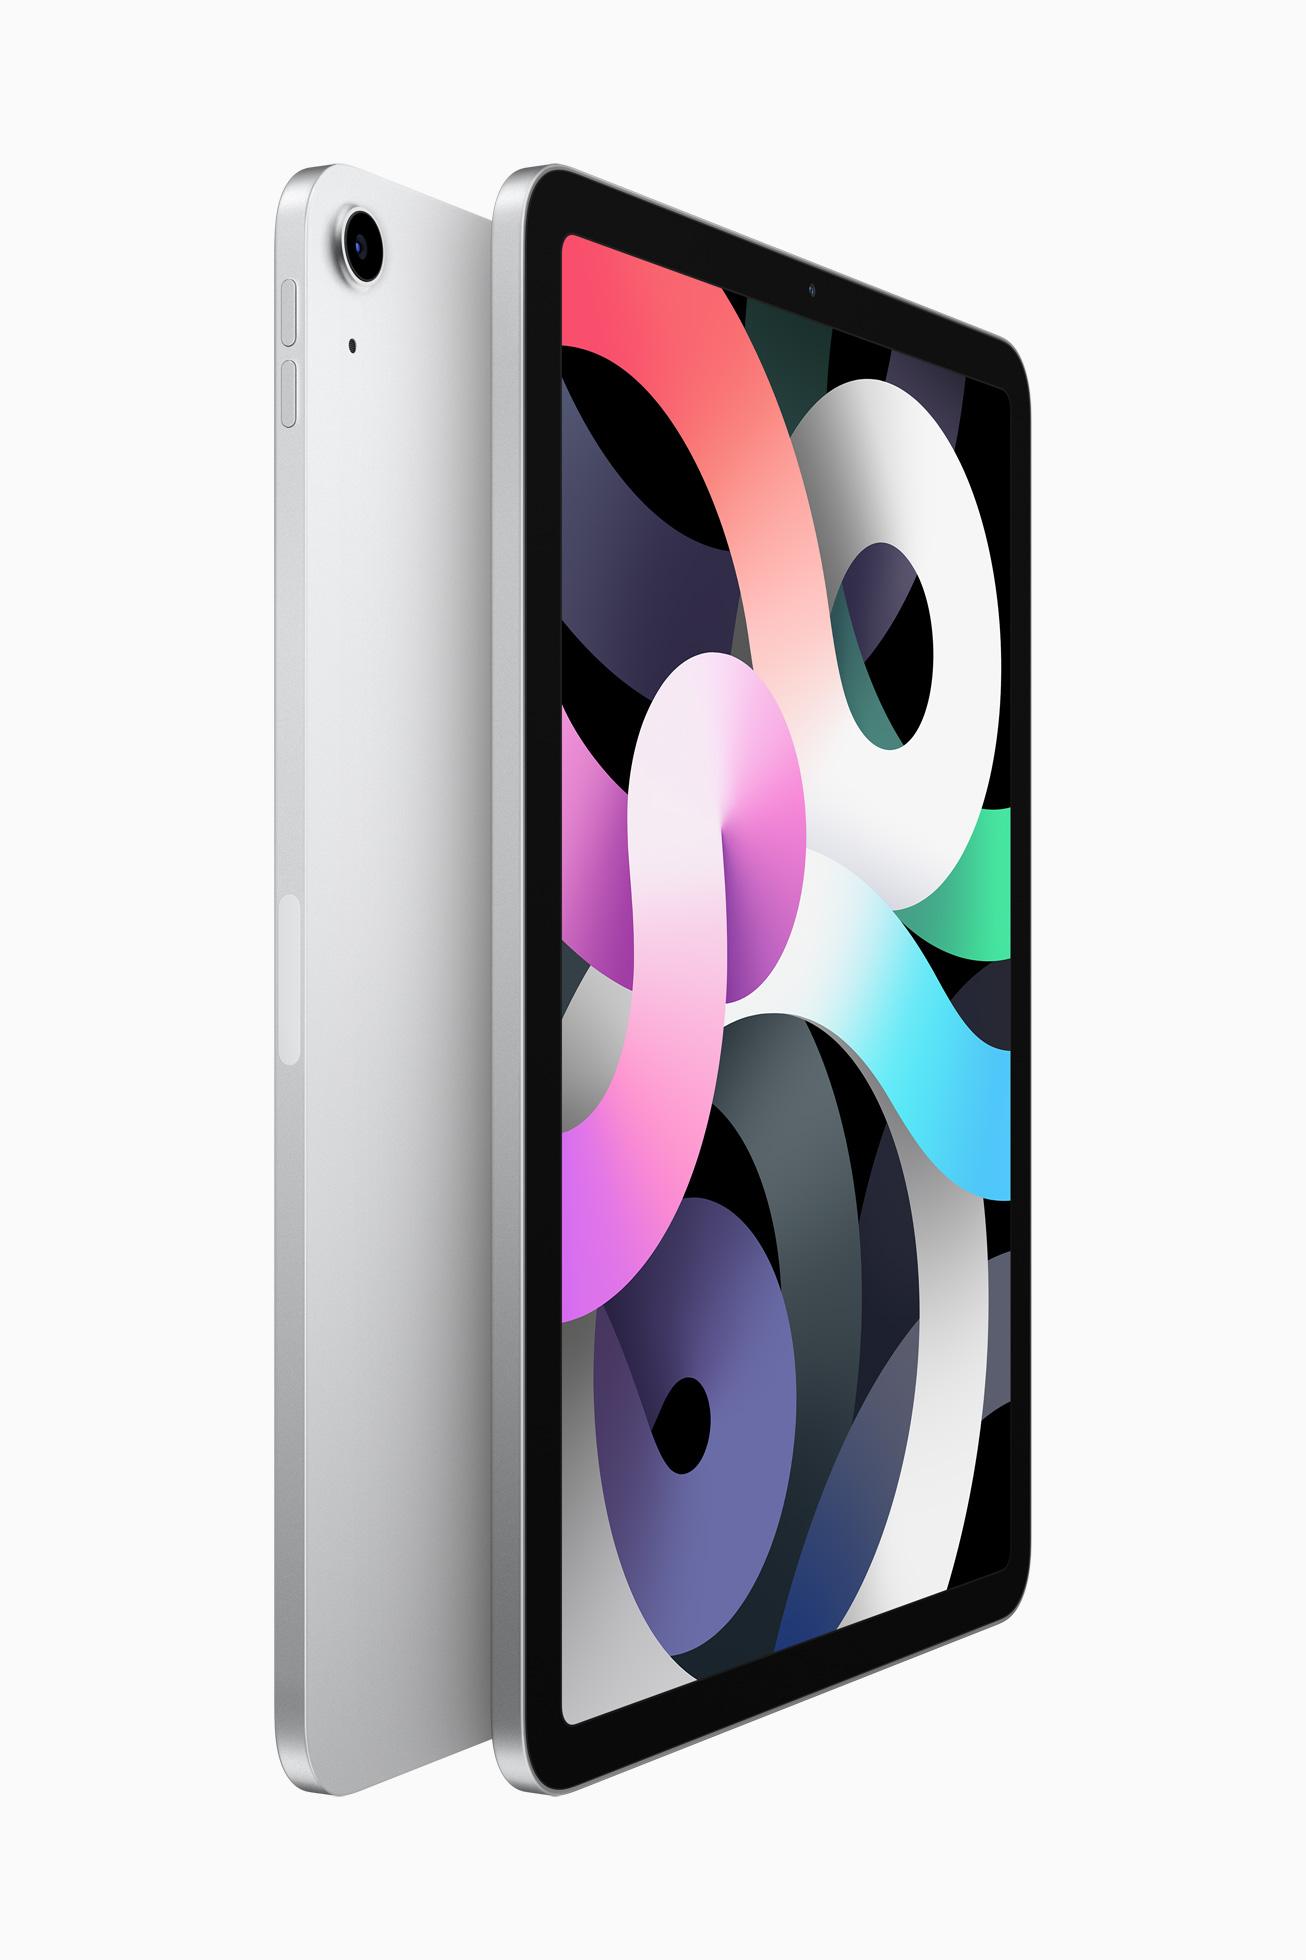 apple new-ipad-air silver 09152020 carousel.jpg.large 2x